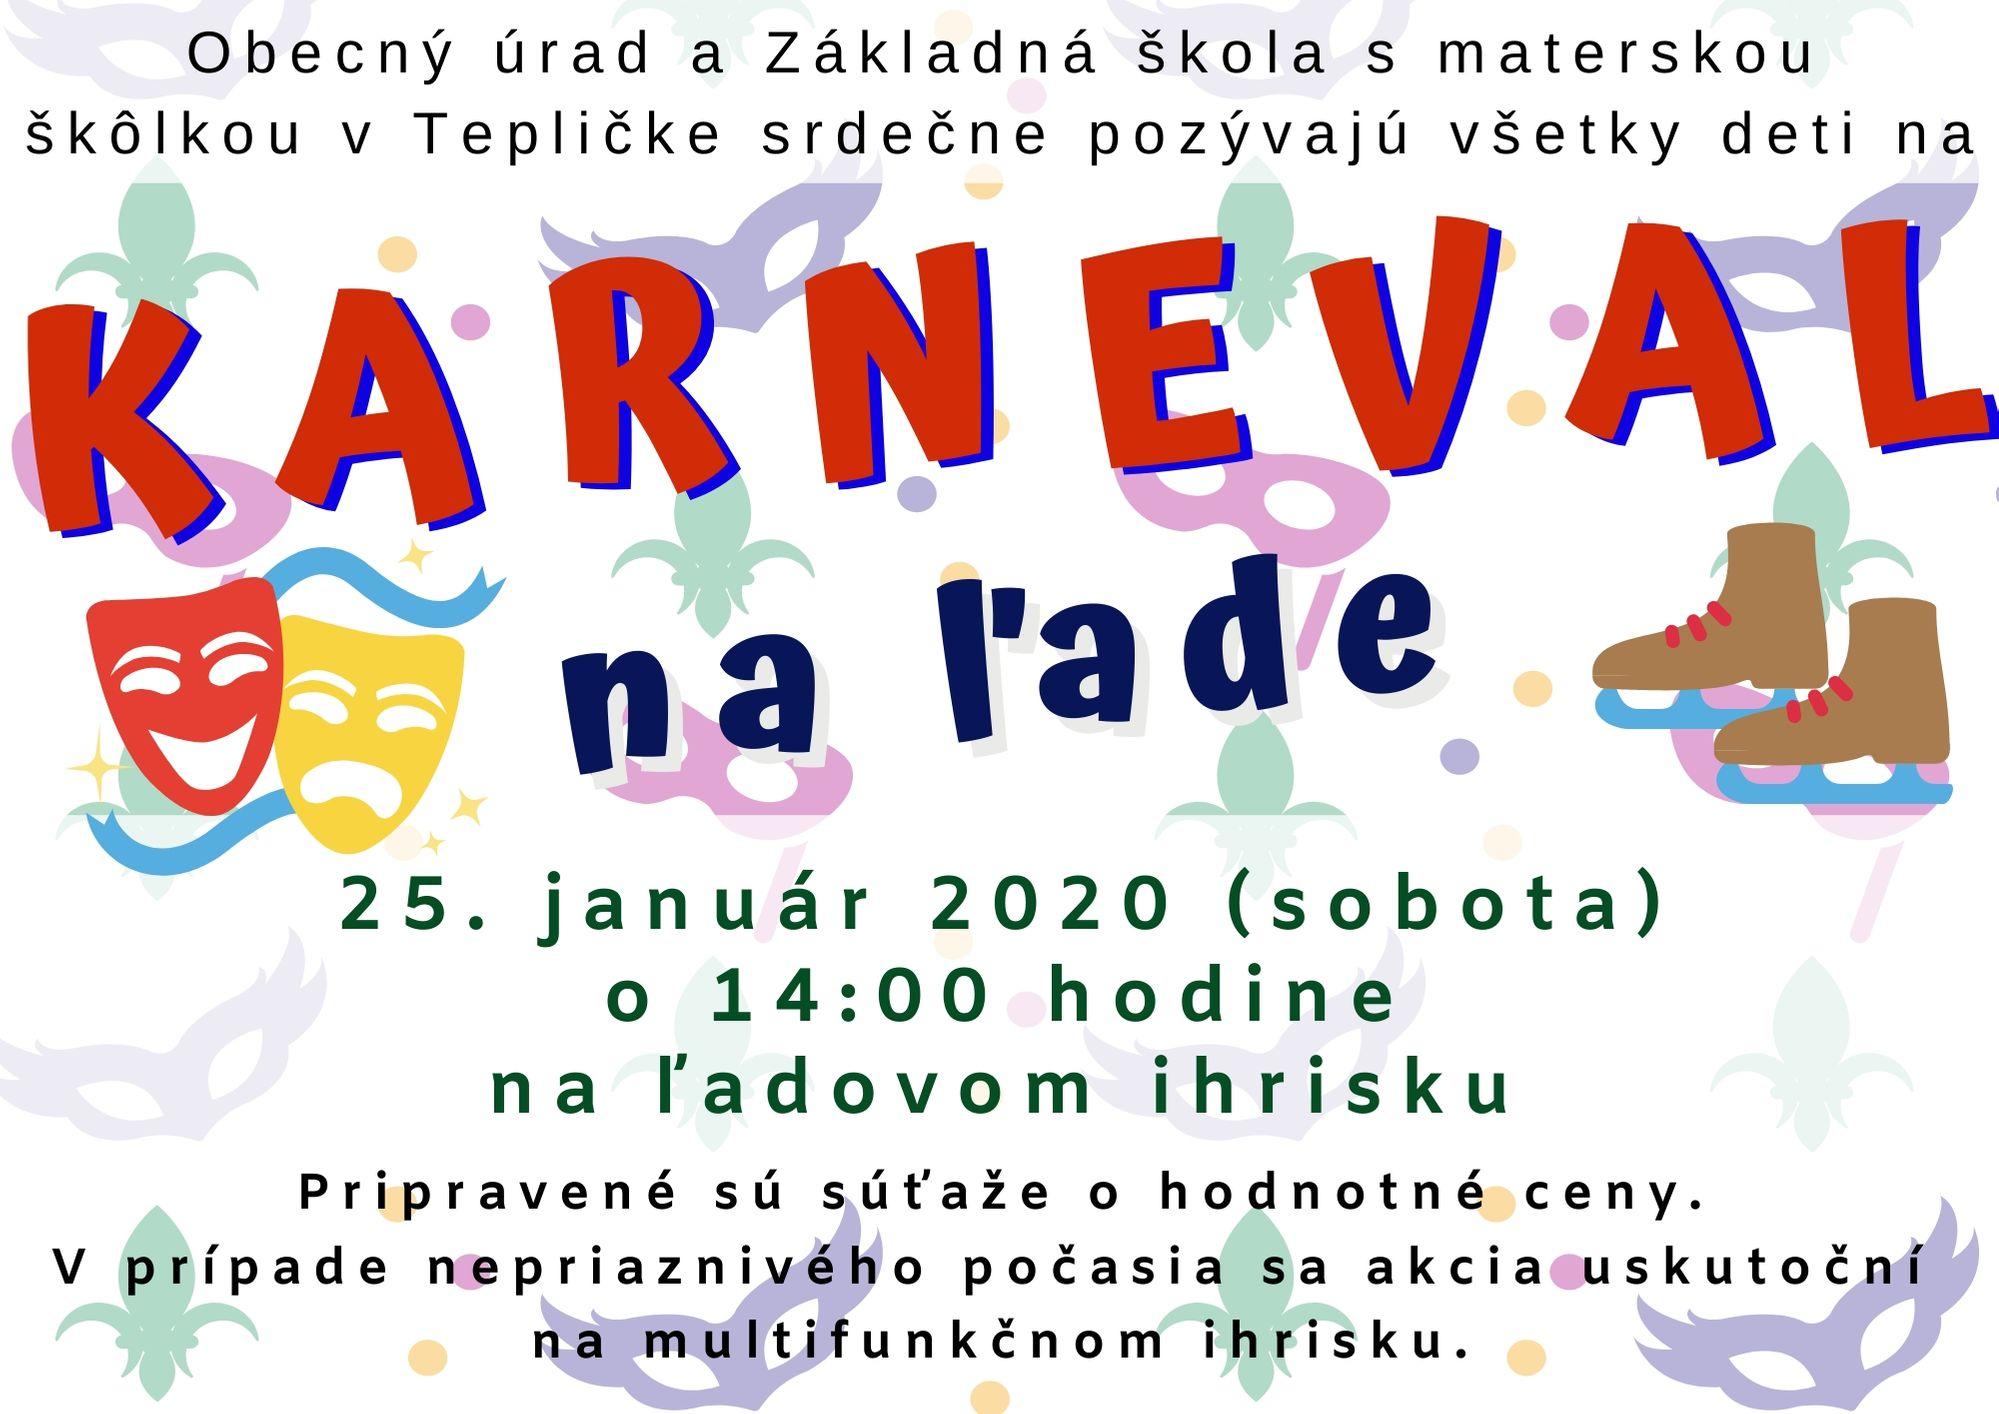 karneval-na-lade-teplicka-25_1_2020.jpg